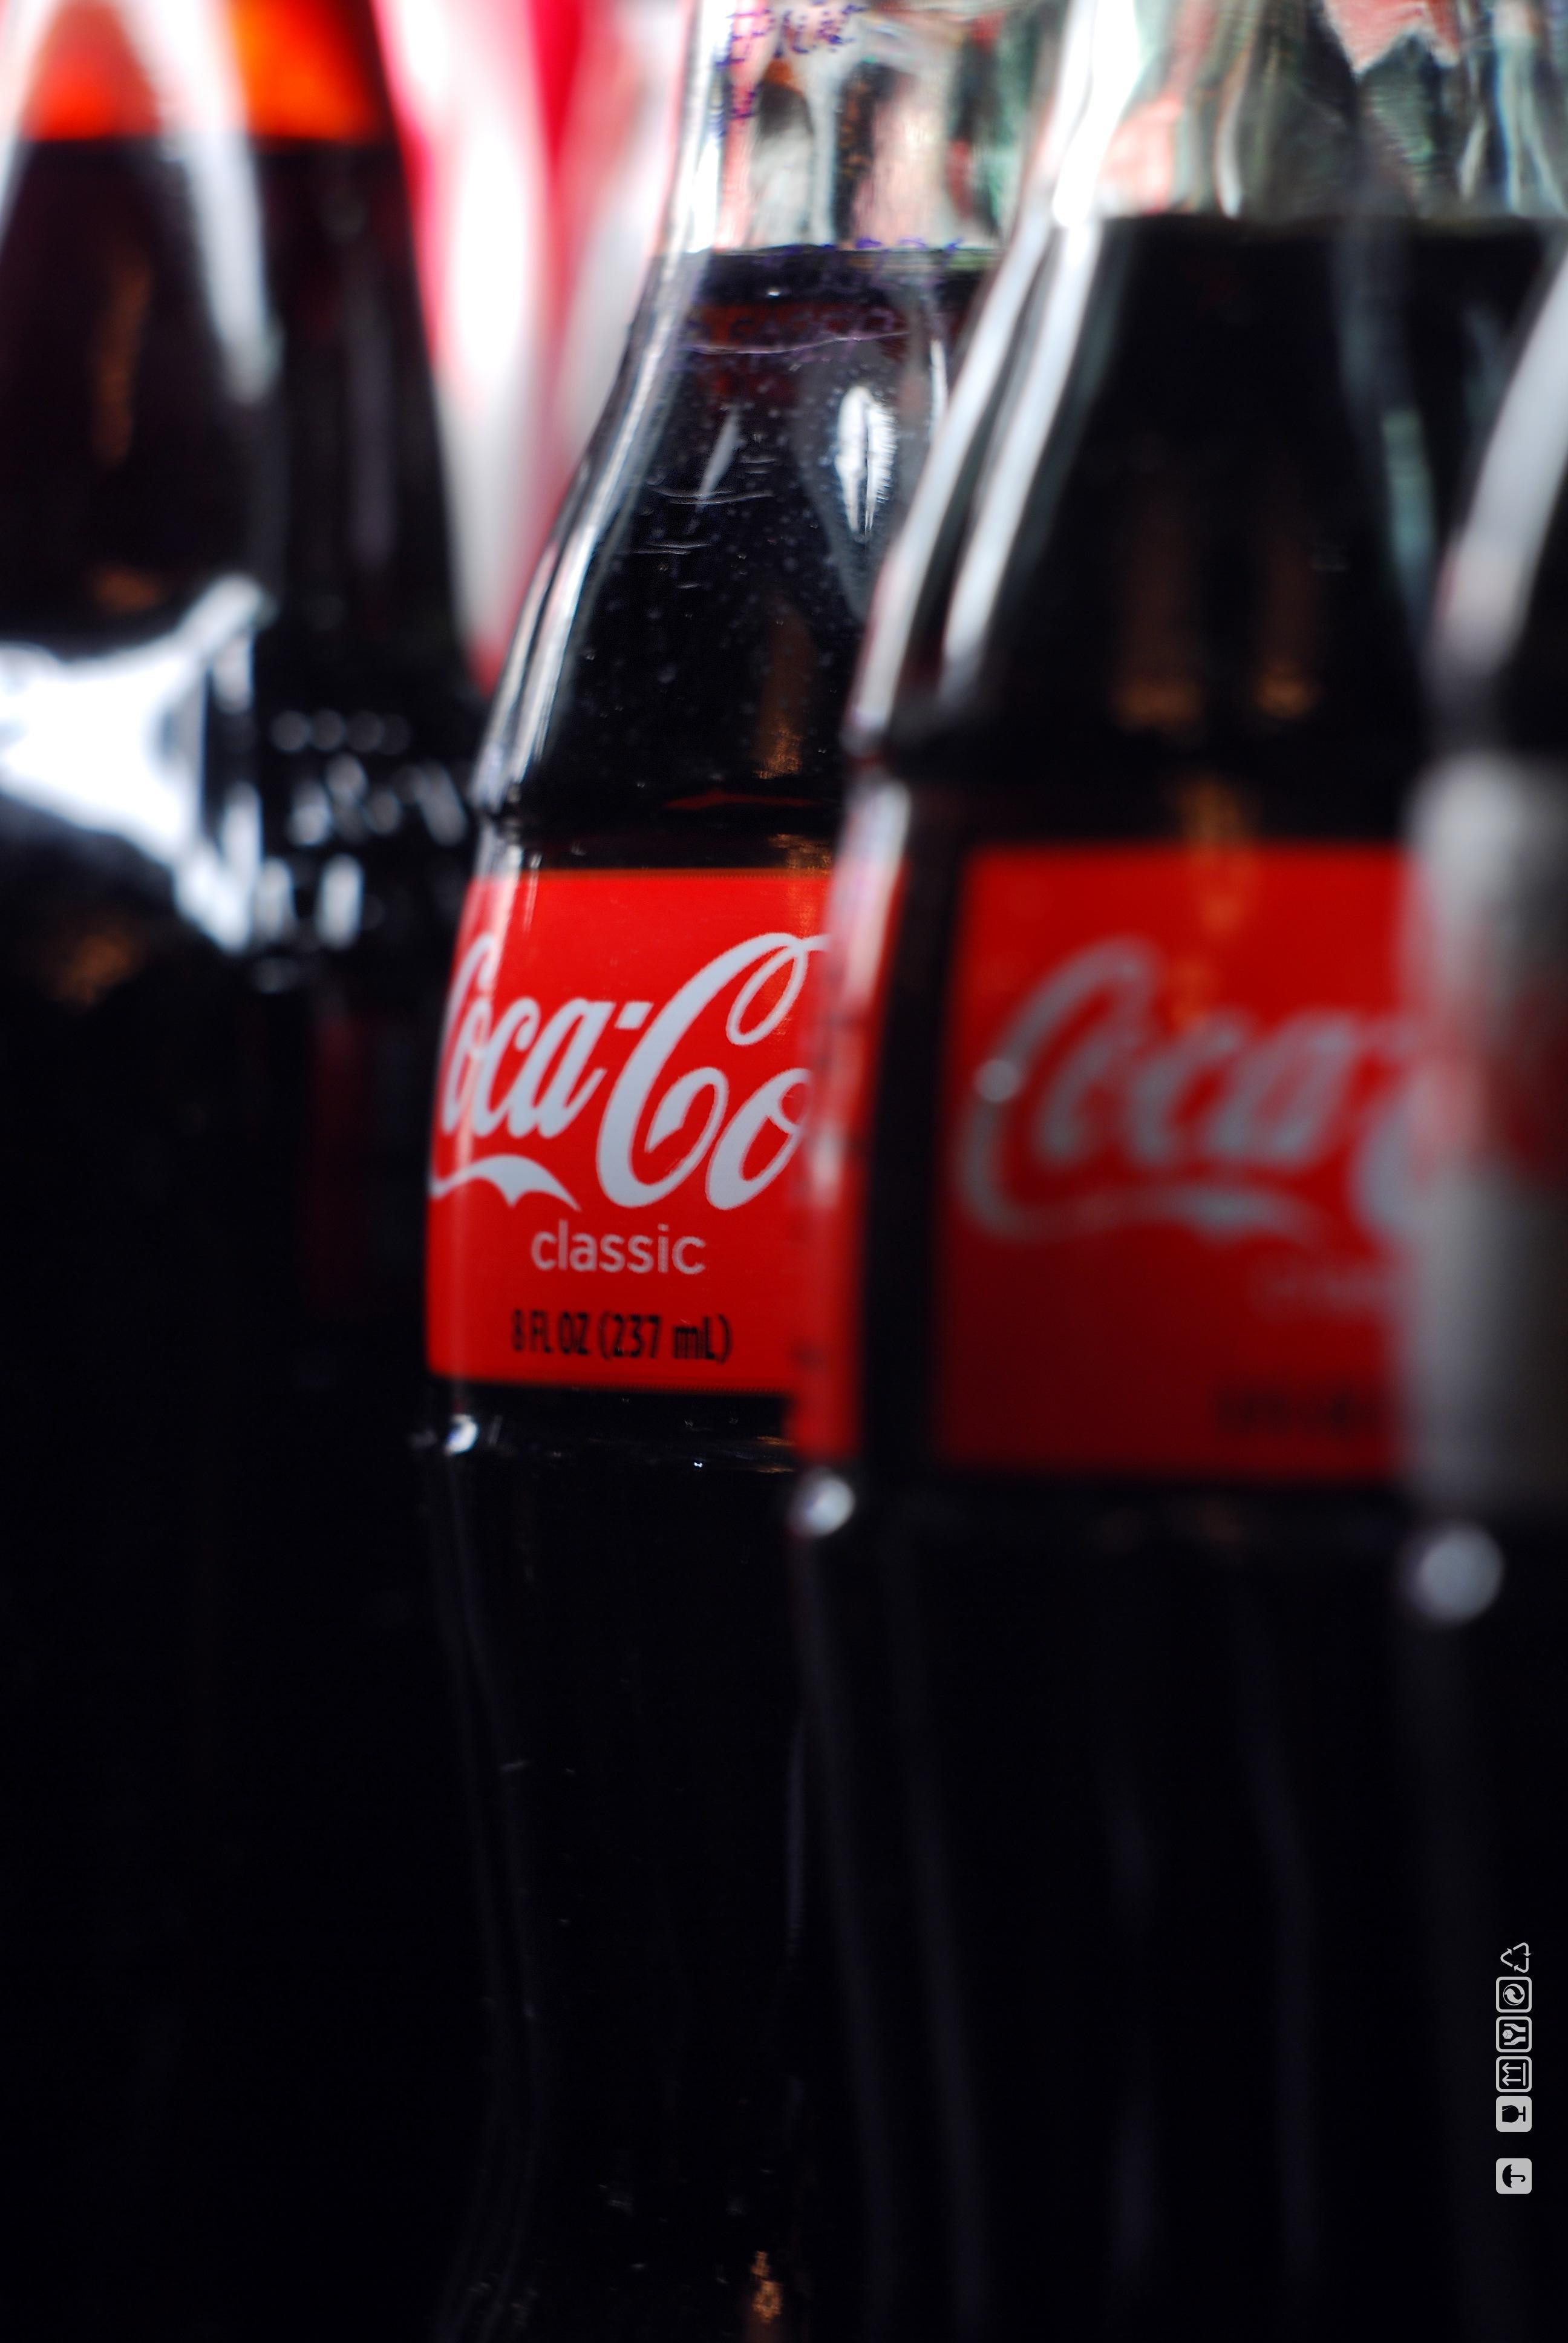 Dating coca cola bottles